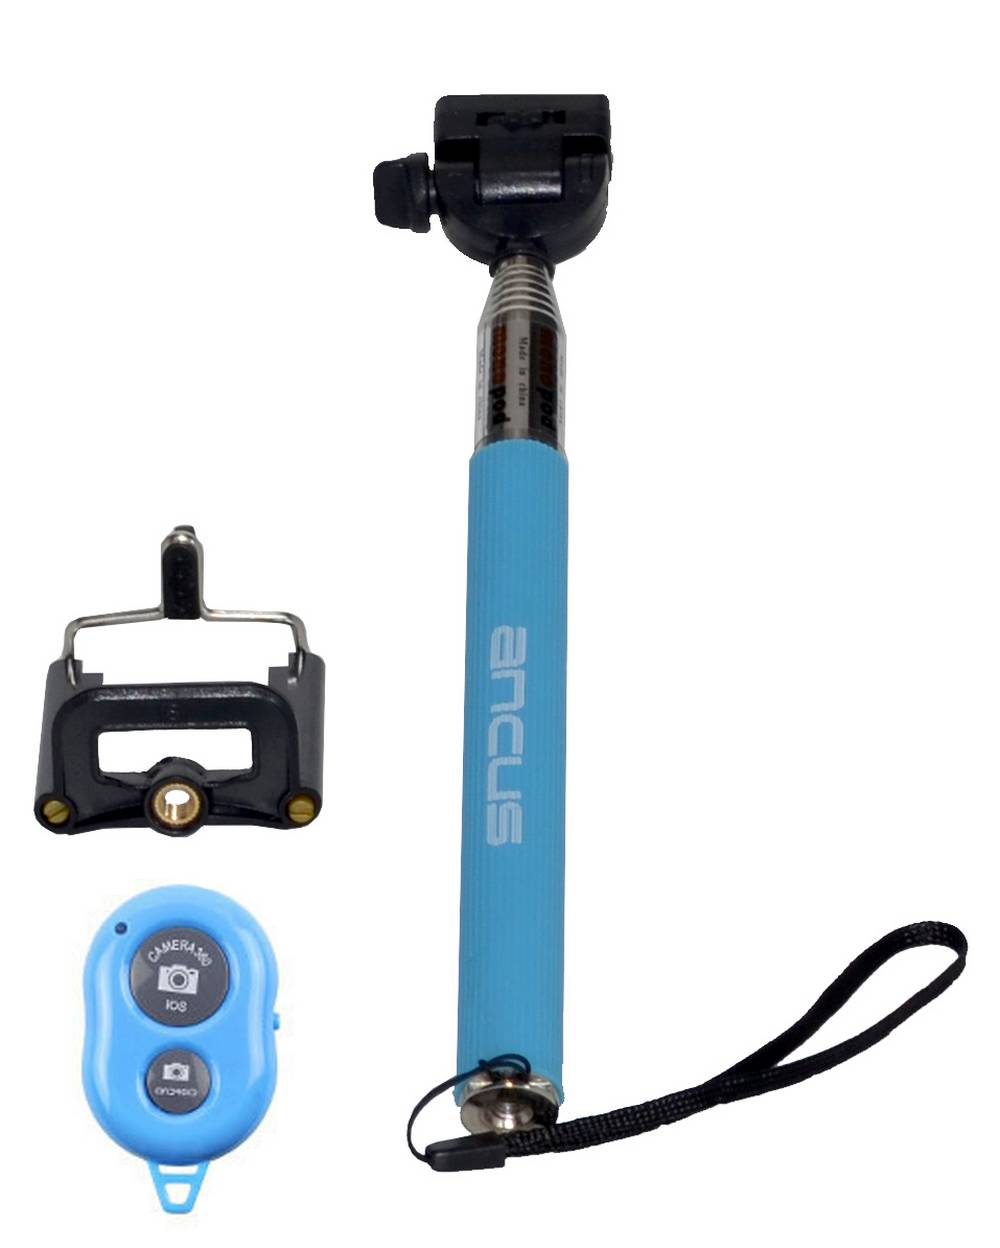 Selfie Stick Ancus Colour Bluetooth Μπλε με χειριστήριο (Μήκος Κονταριού 20cm, Μήκος Ανοίγματος 97cm)